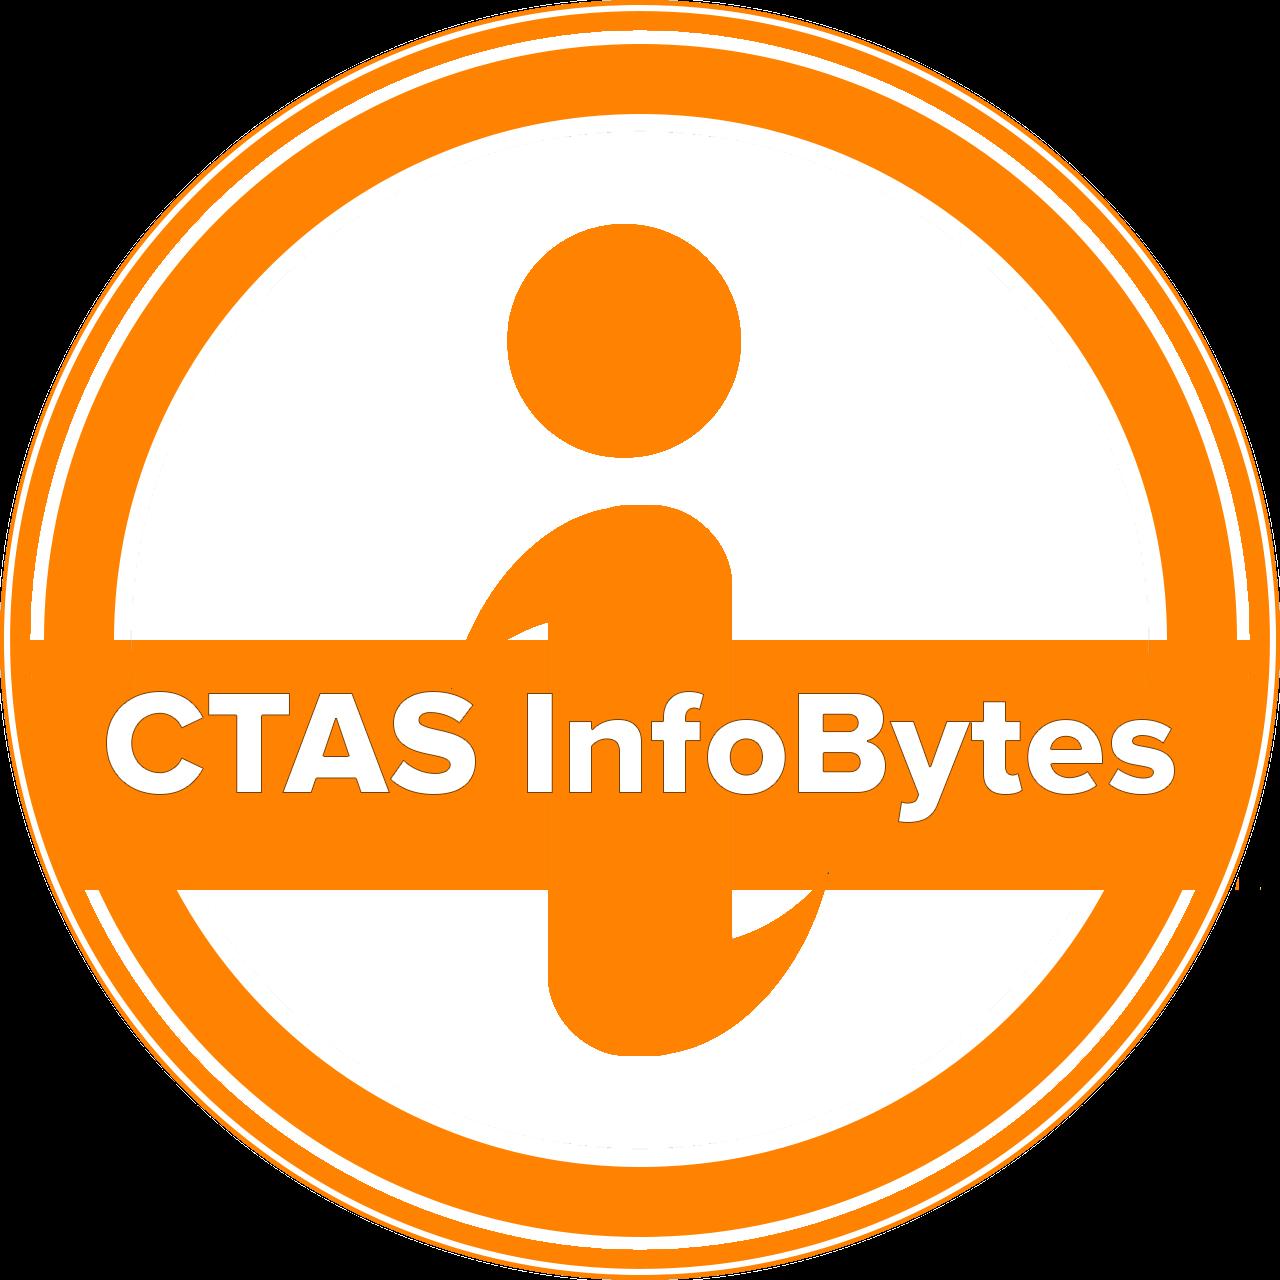 CTAS InfoBytes logo